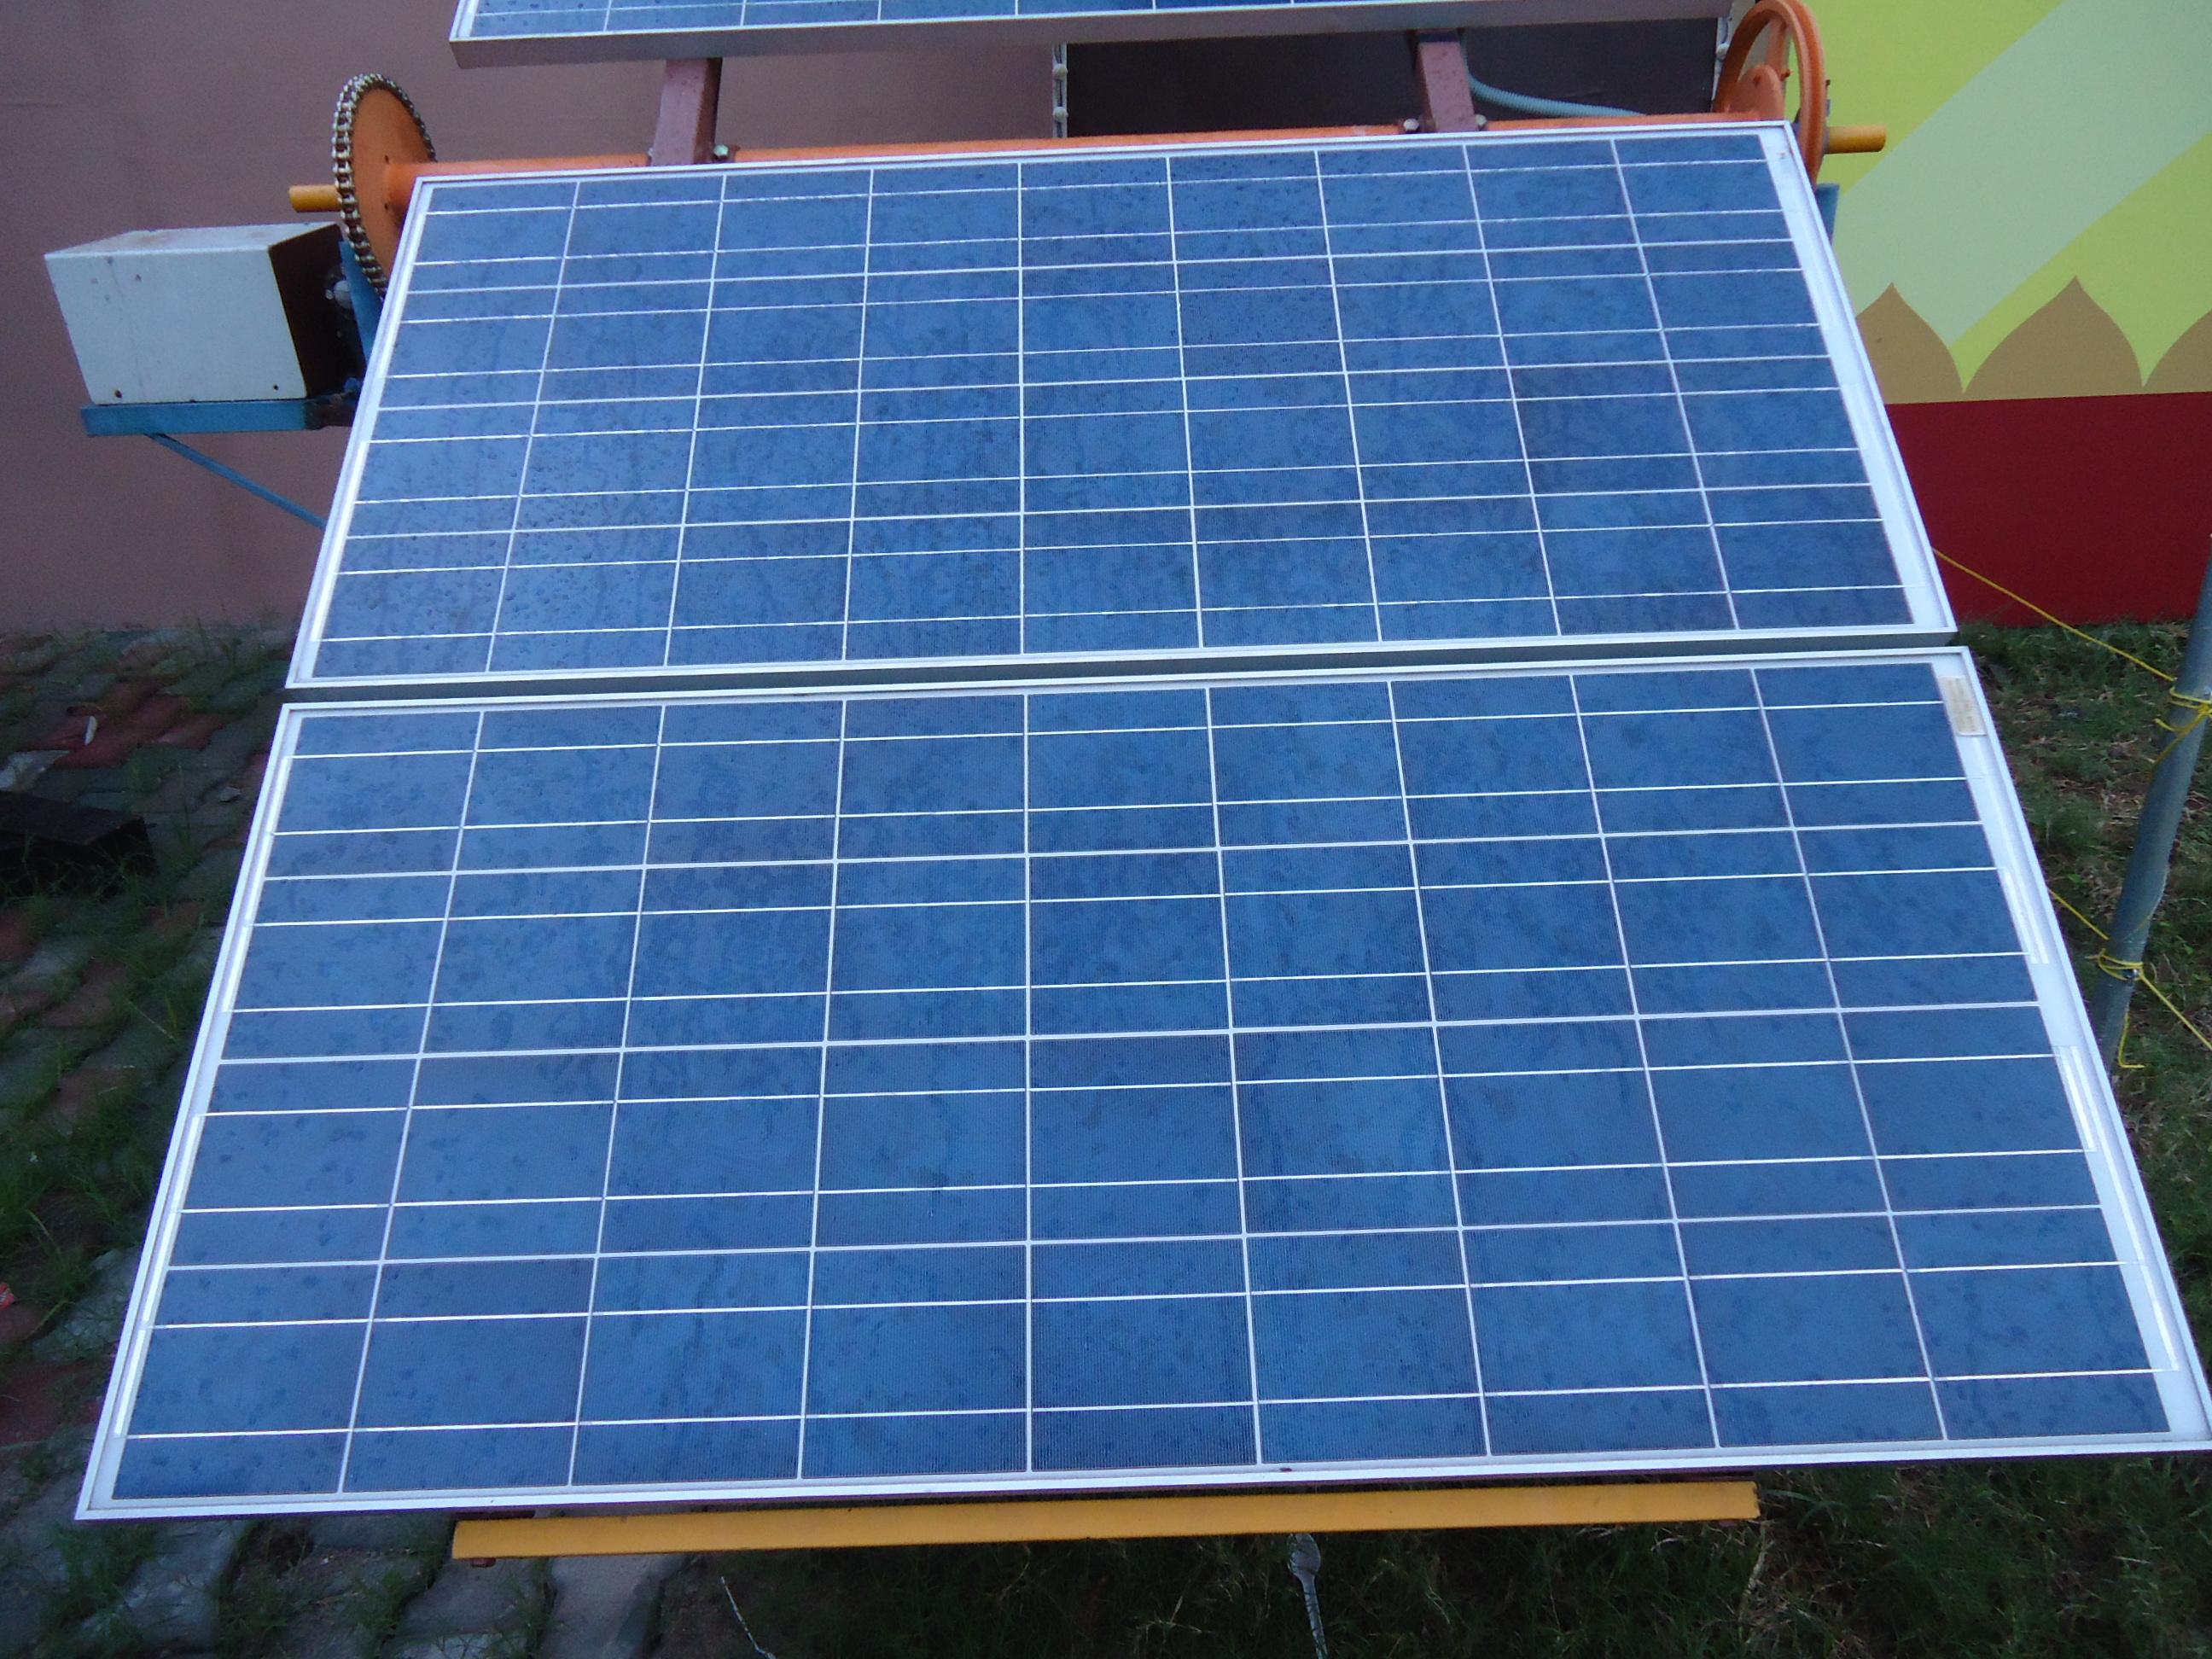 File:Solar Panel Flat.JPG - Wikimedia Commons